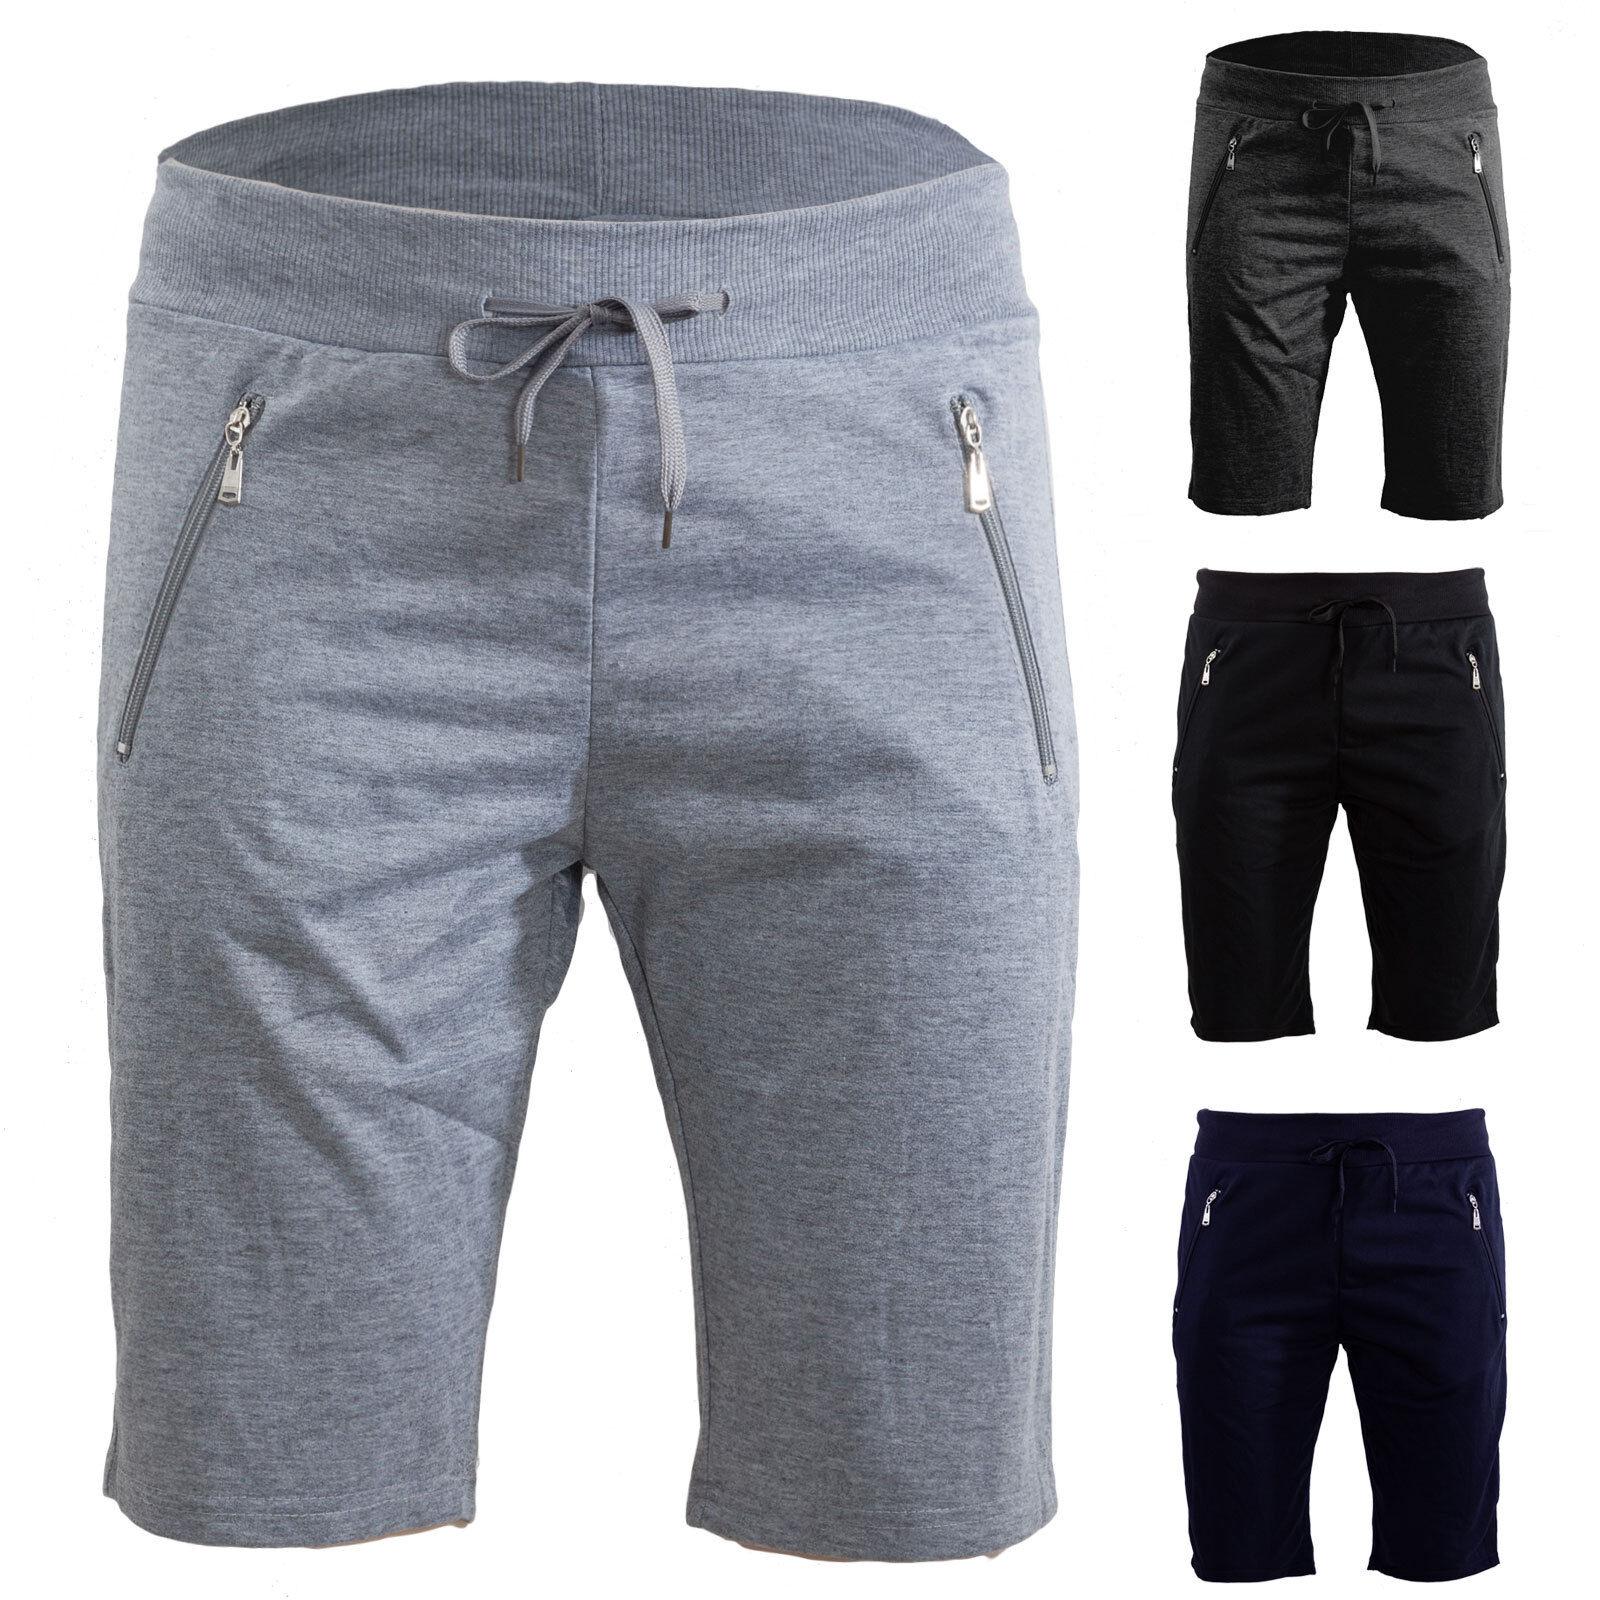 Men/'s Trousers Sports Bermuda Cotton Blend Zip Shorts Shorts St-5049